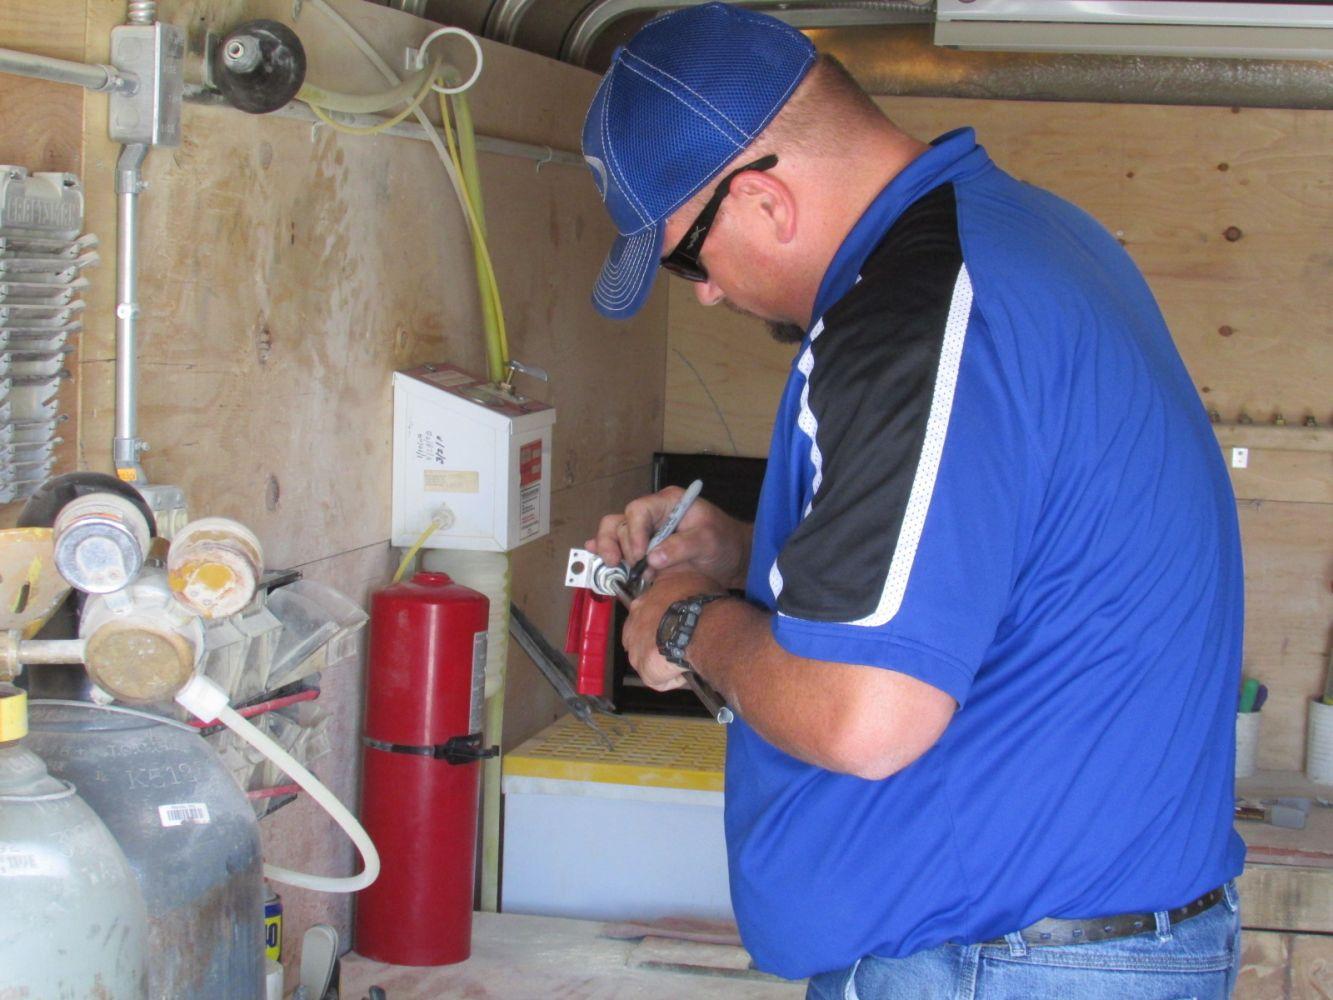 Man servicing a fire extinguisher.